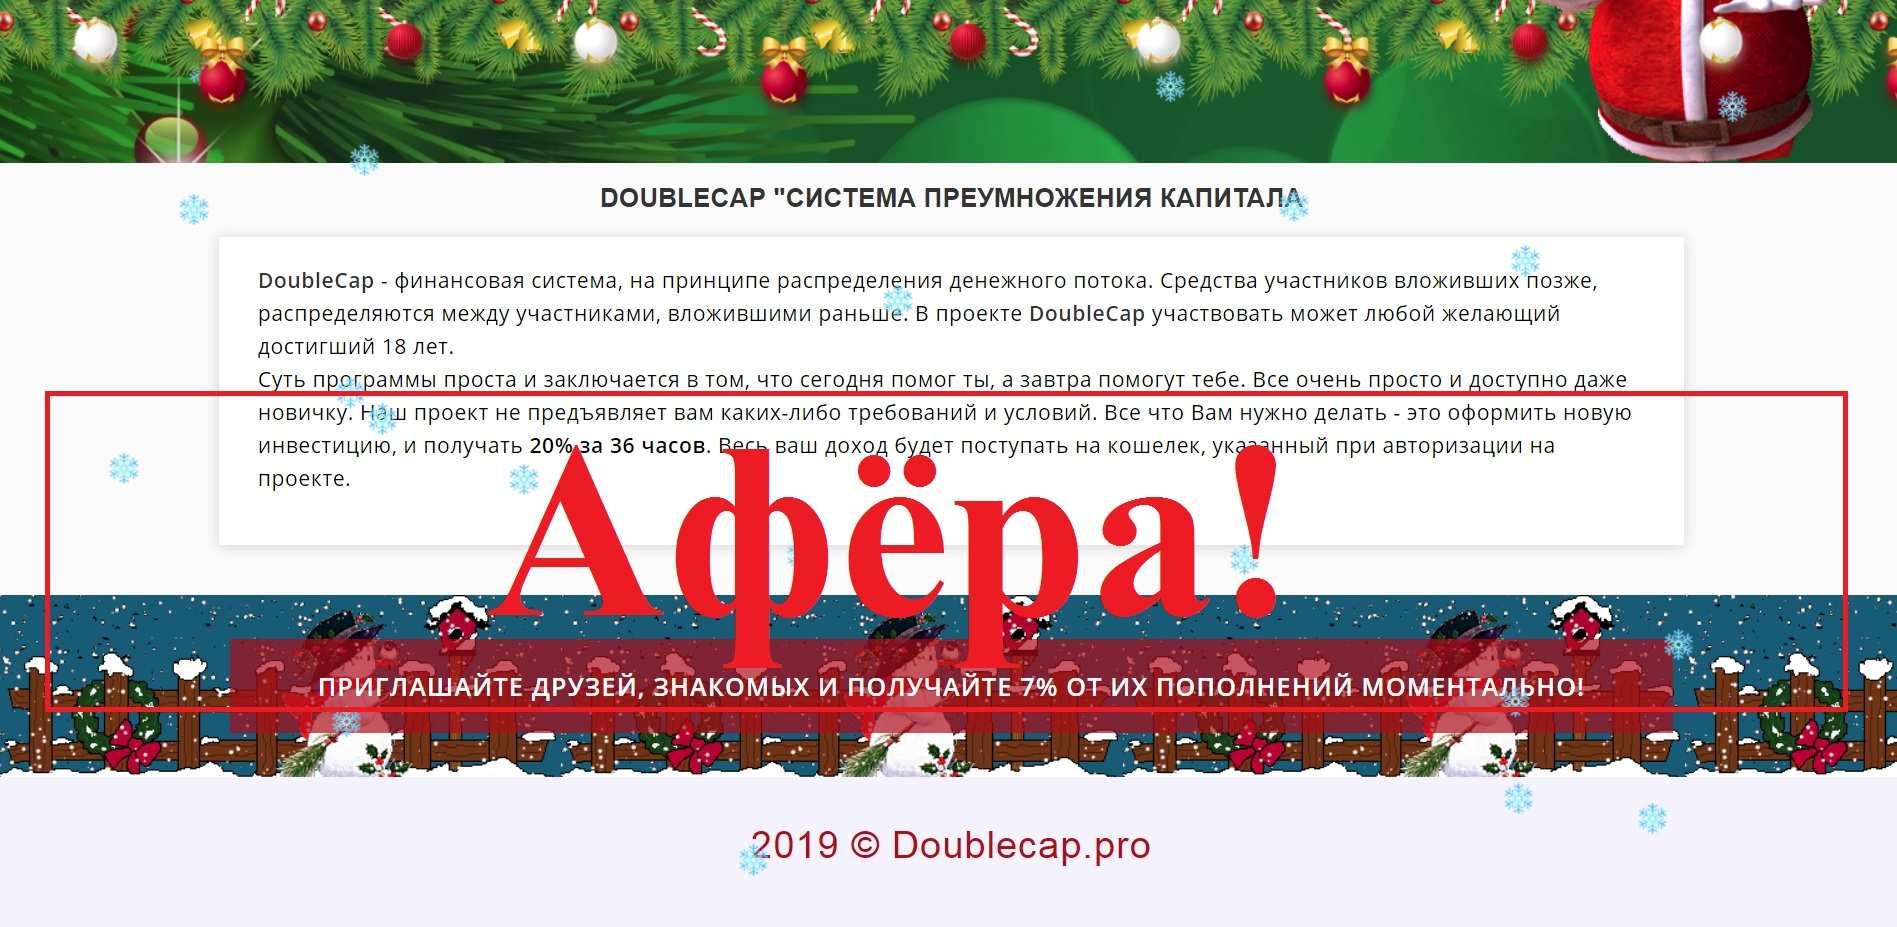 DoubleCap – реальные отзывы о https://doublecap.pro